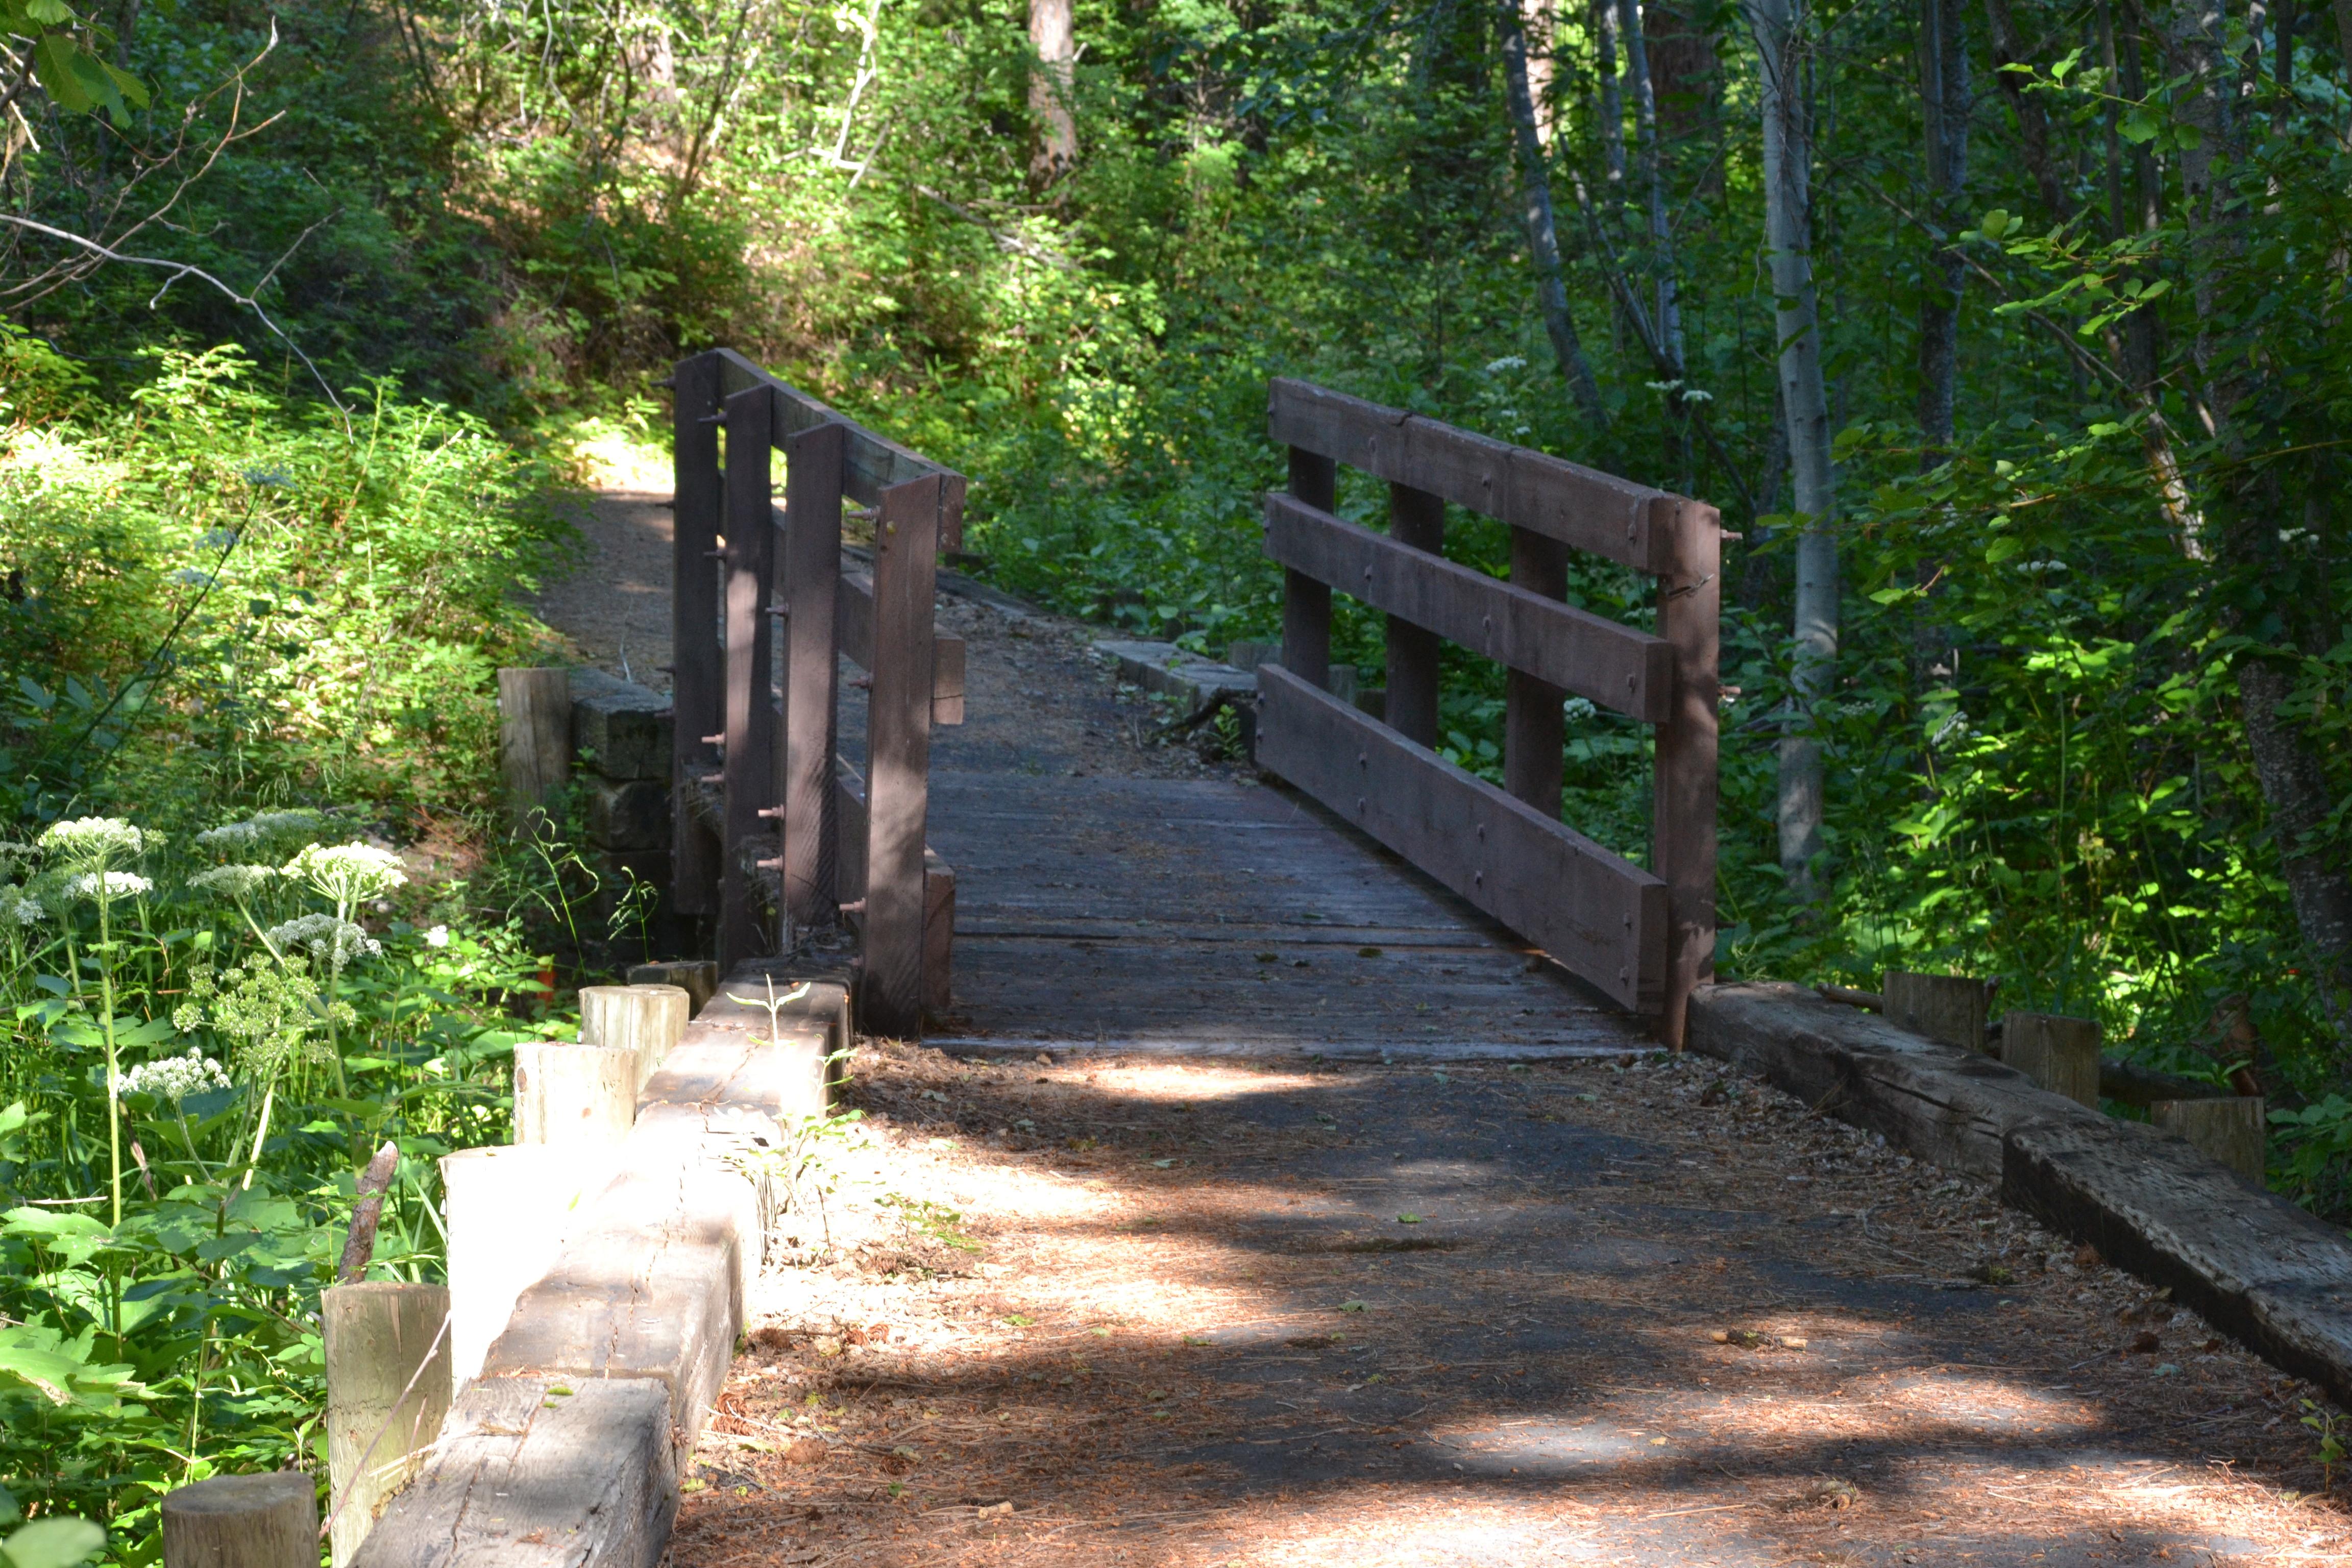 DSC_0027 (1)Bridge to the Wetmore CG trail